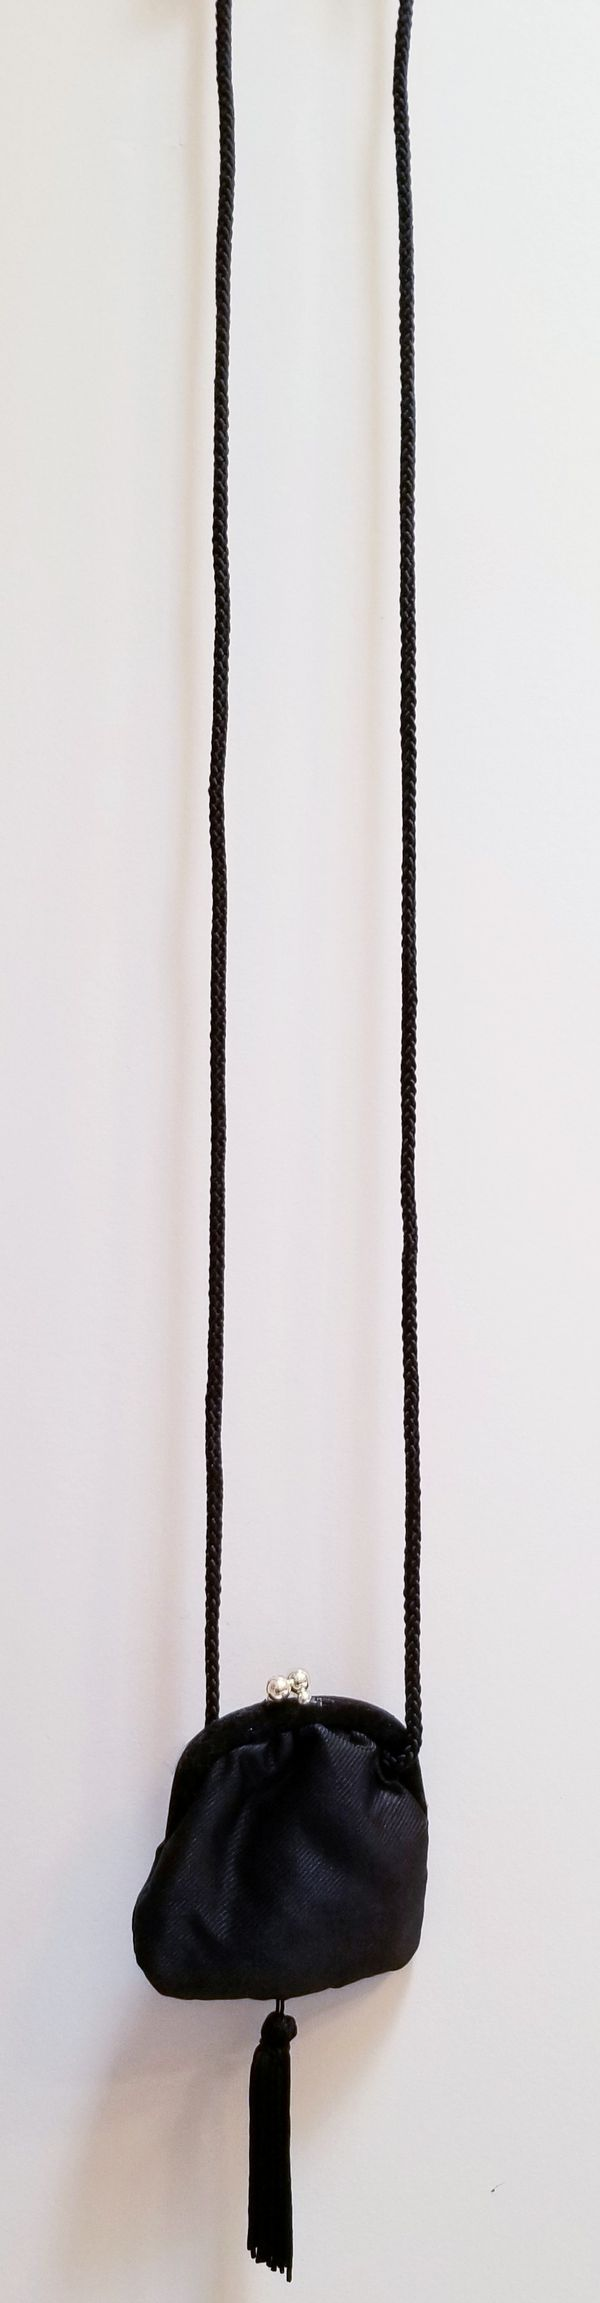 Black long cord small purse